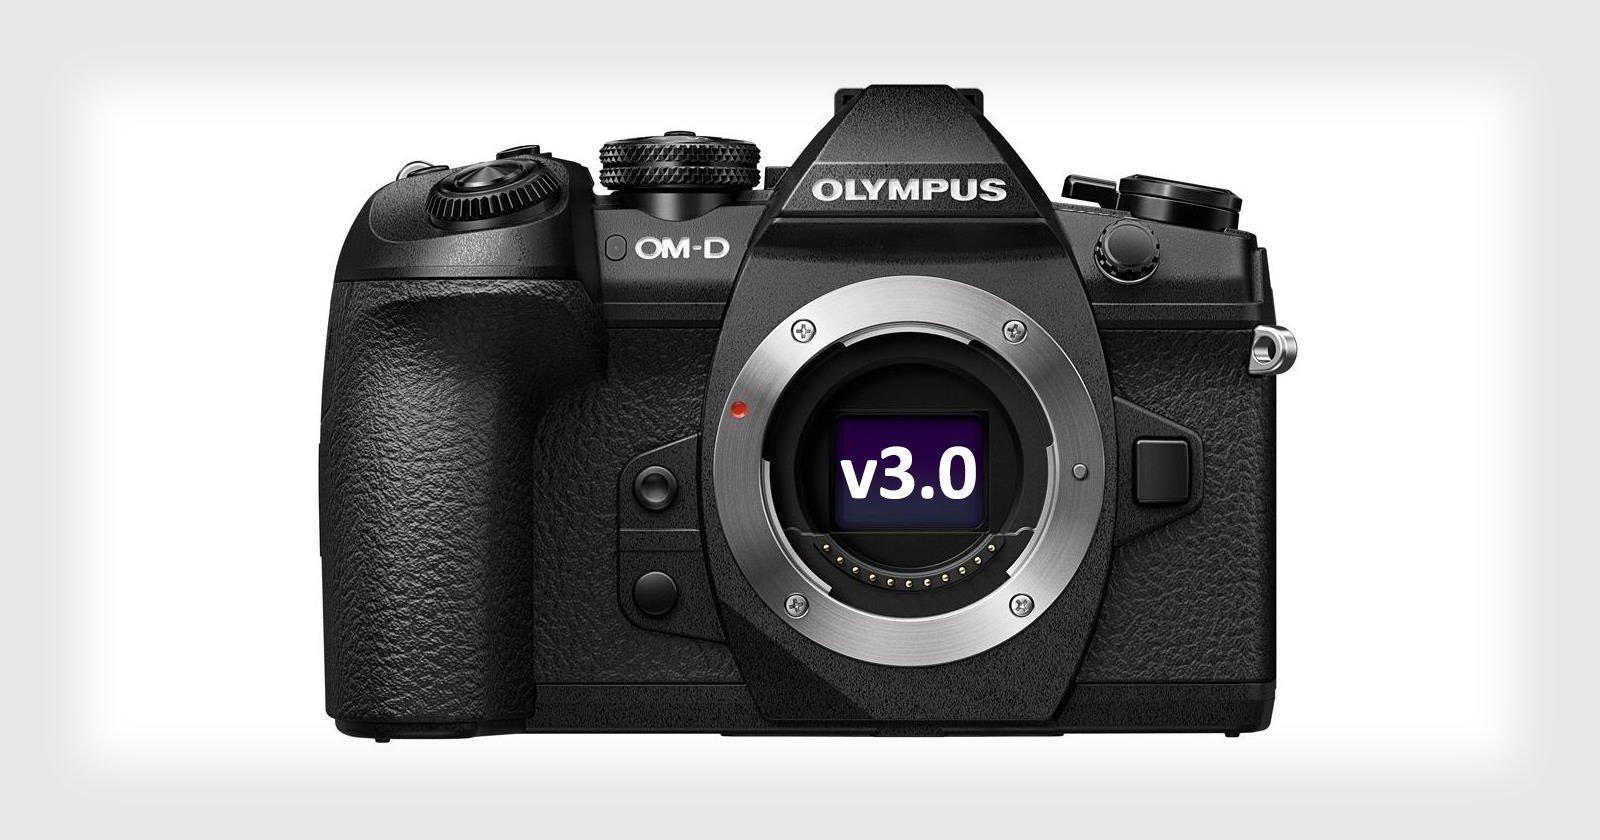 OLYMPUS DIGITAL CAMERA UPDATER 1.03E-M1 DRIVER FREE